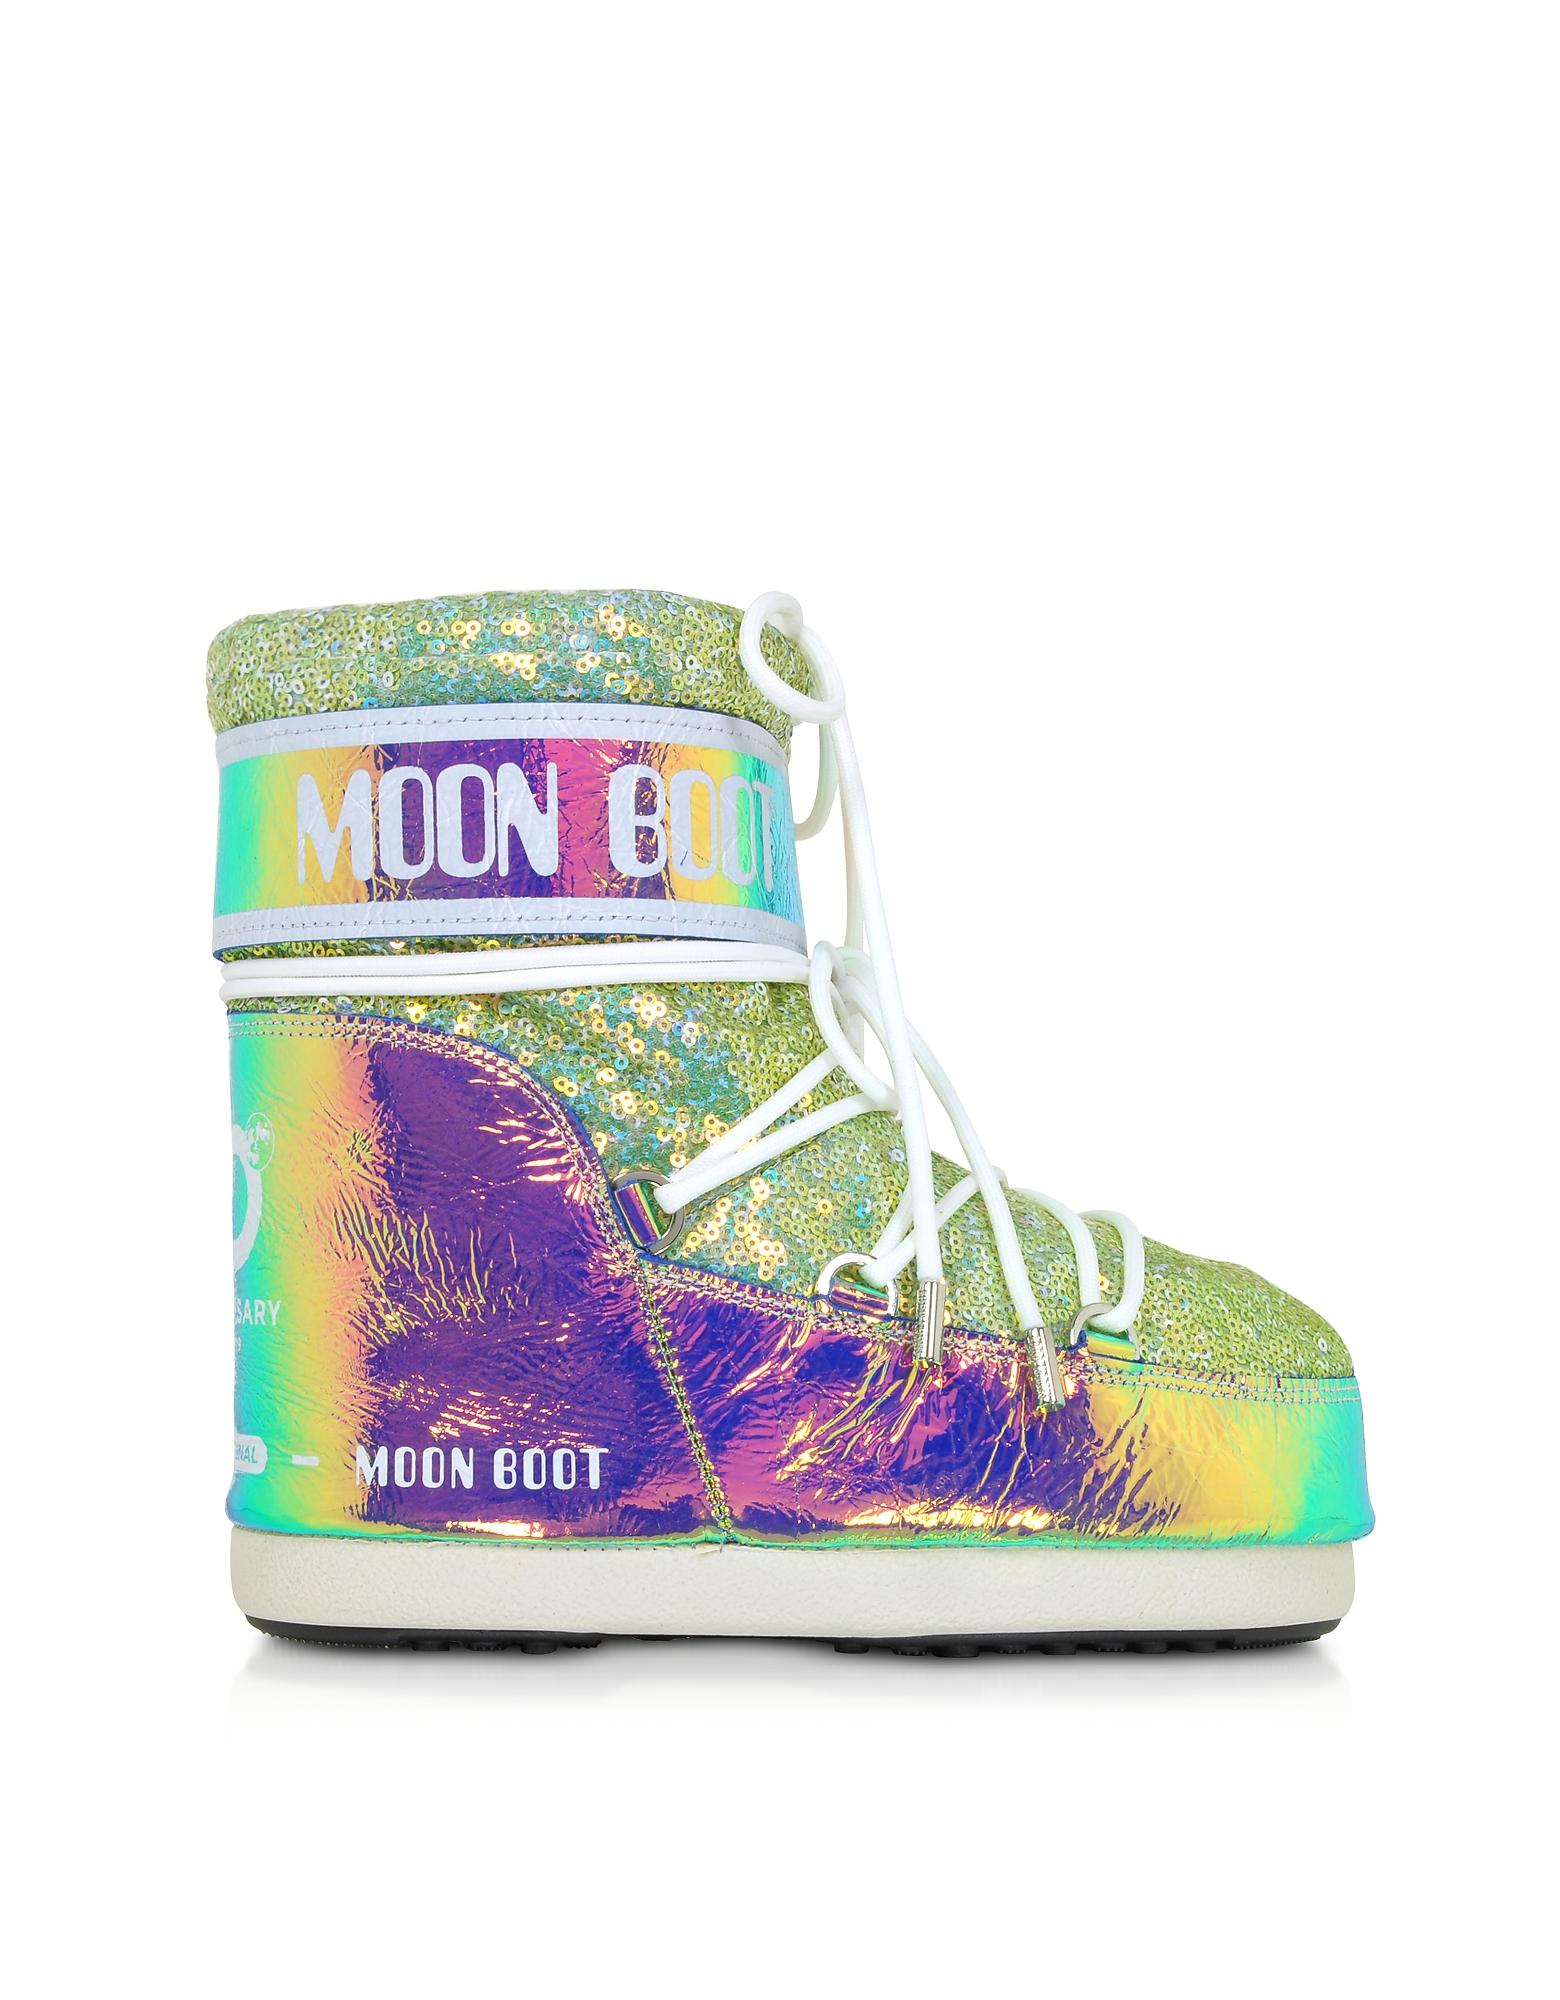 Moon Boot Designer Shoes, Classic 50 Aquamarine Leather Hologram Boots